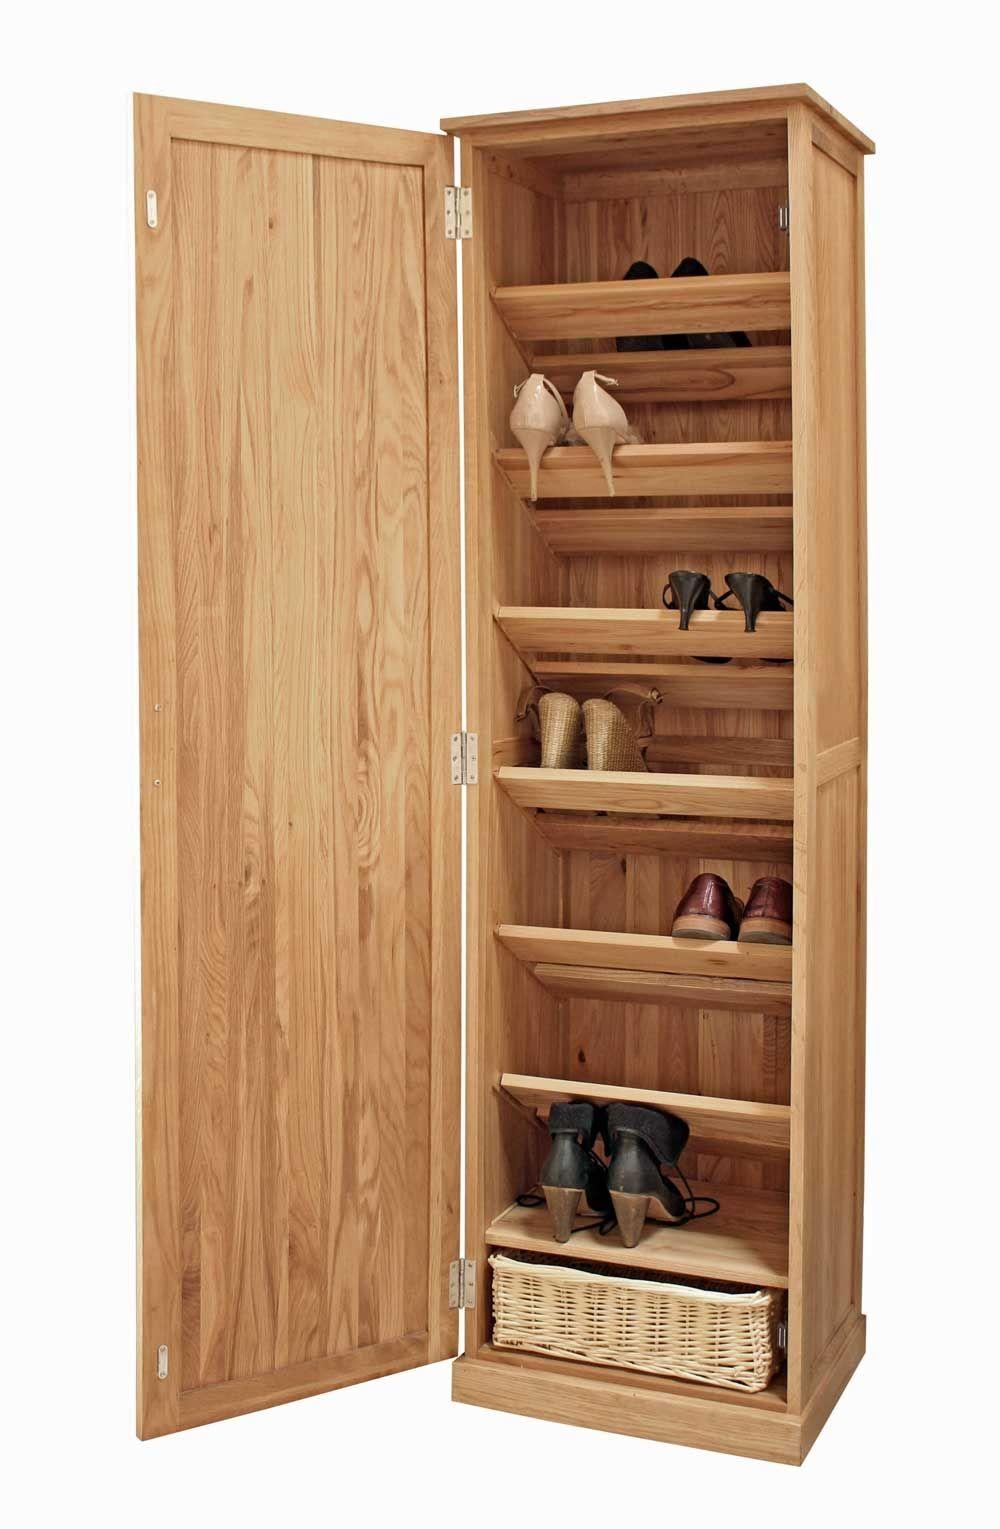 Tall Slim Shoe Storage Cabinet Shoe Storage Cabinet Shoe Storage Cabinet With Doors Storage Cabinets